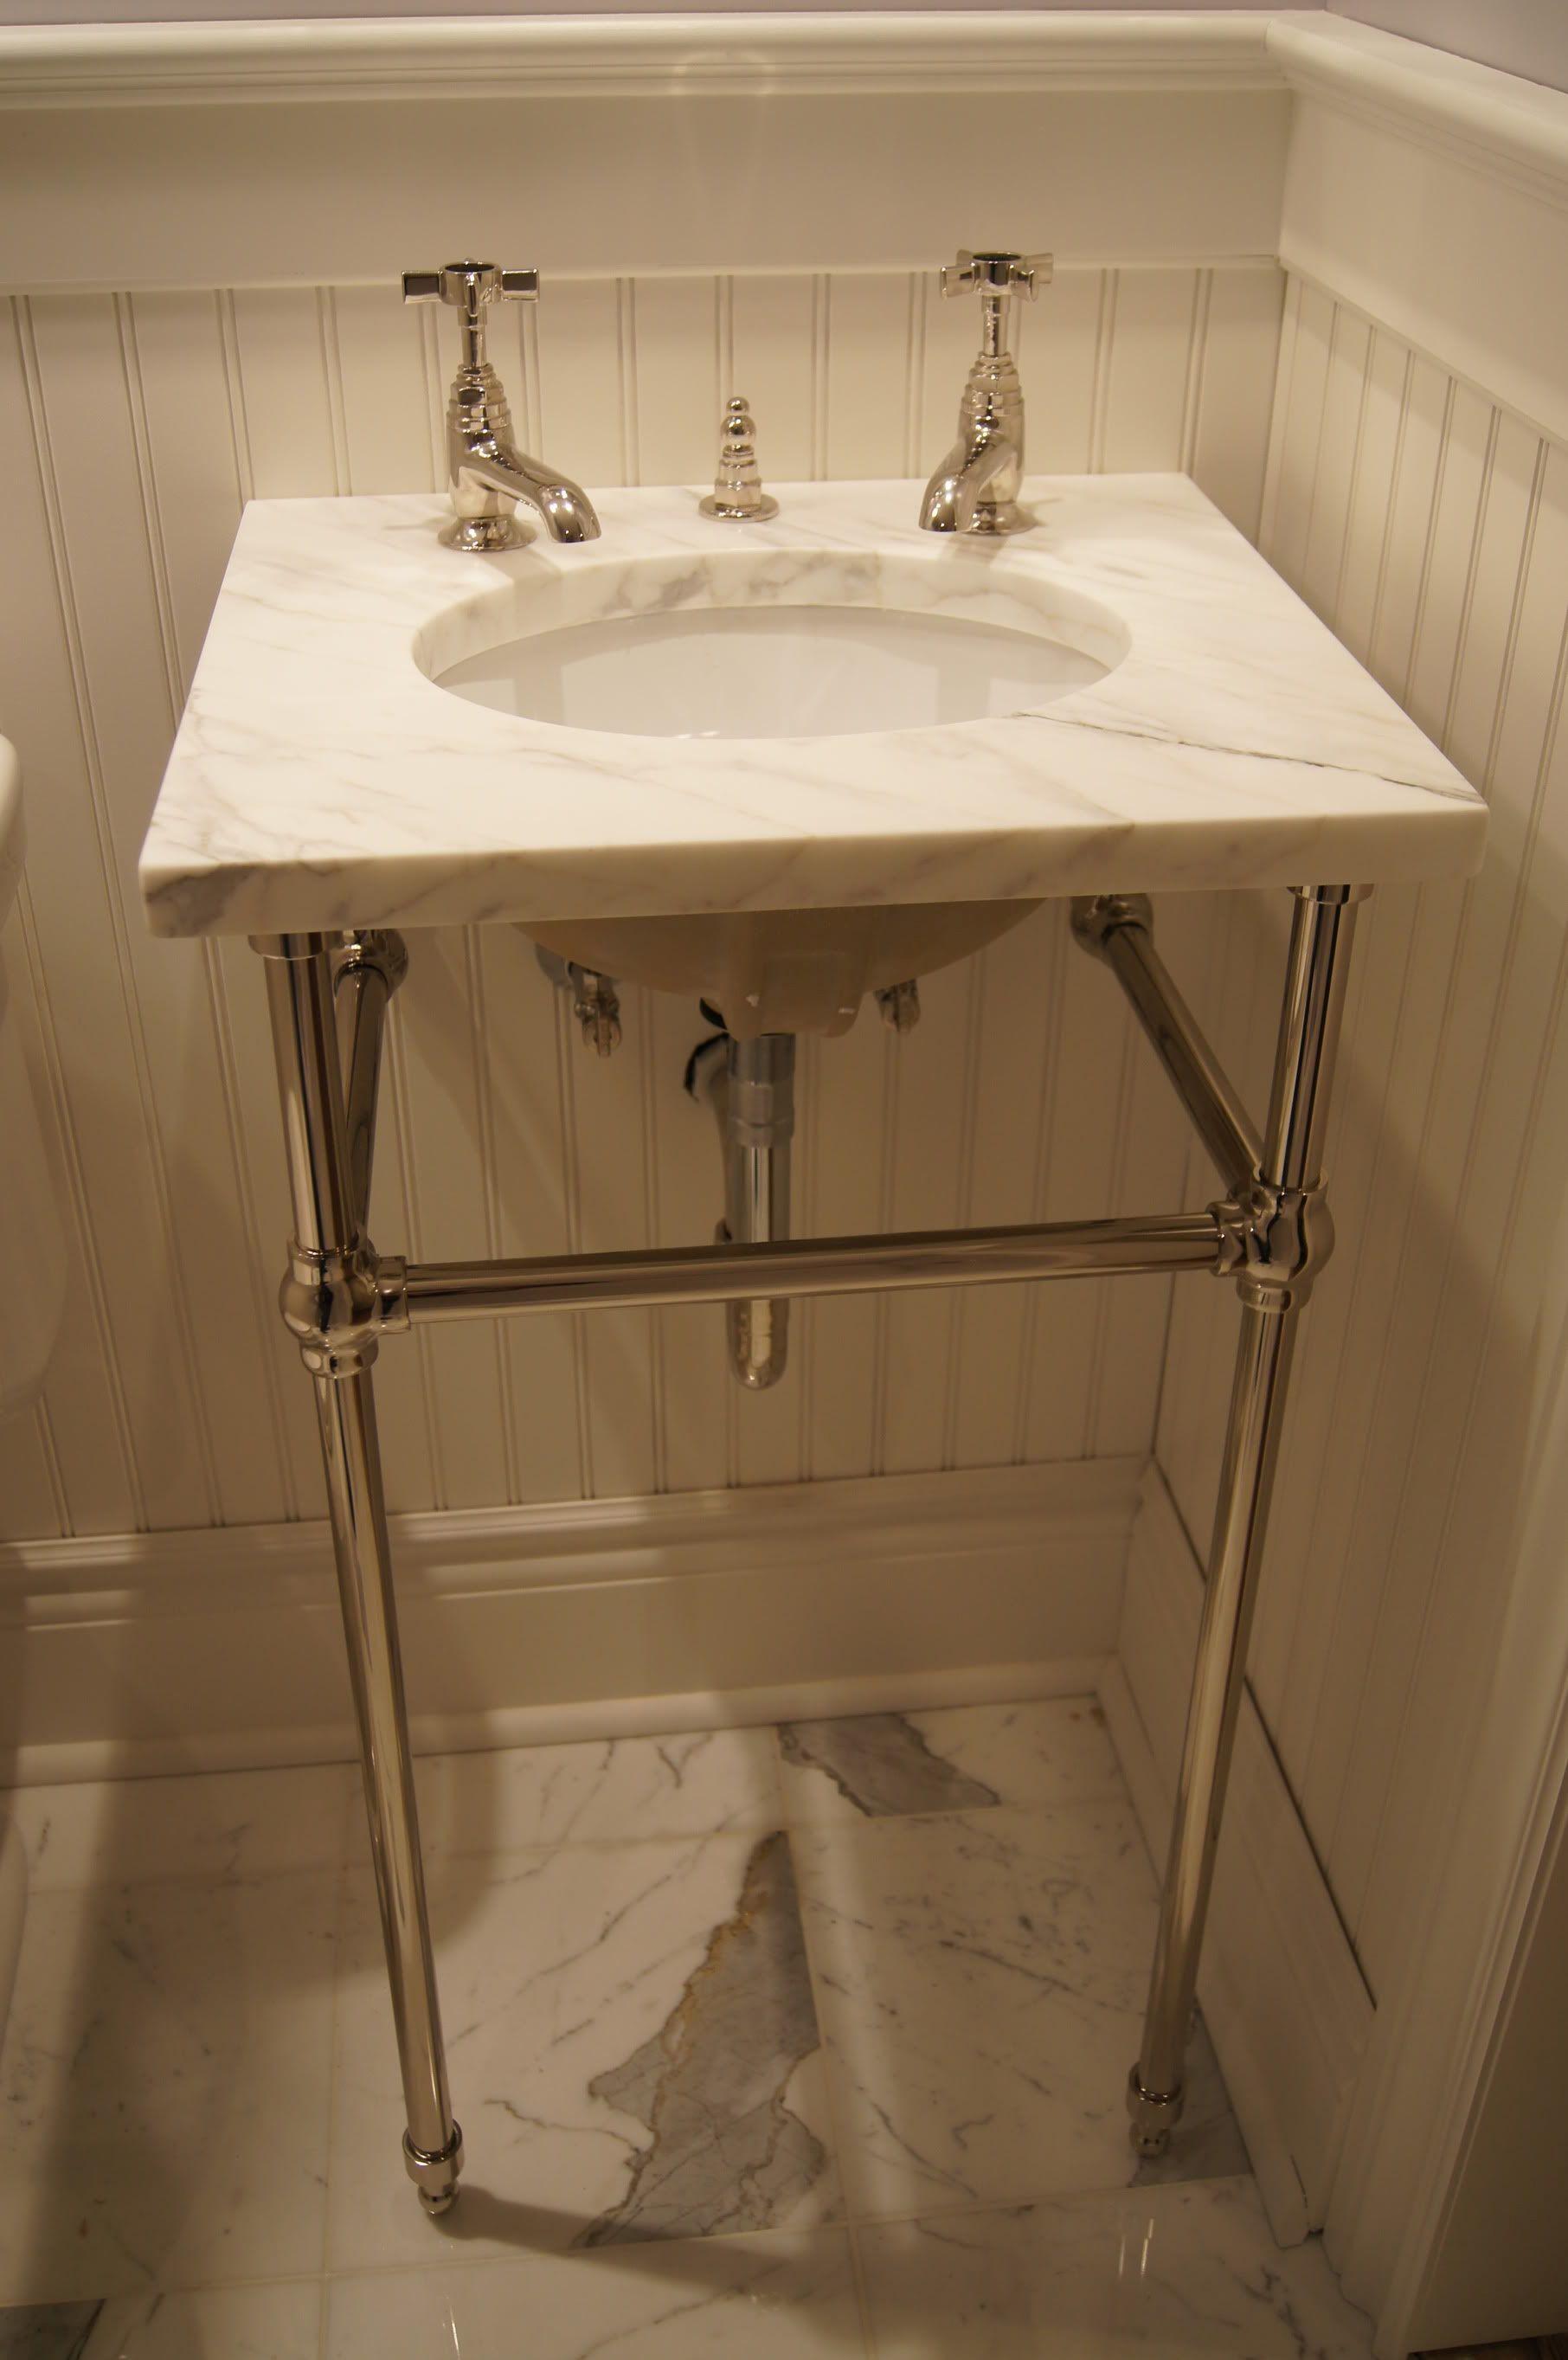 Superb Bathroom Sink with Legs Design - Bathroom Design Ideas ... on top mount bathroom sinks, granite bathroom sinks, vessel sinks, long bathroom sinks, unique bathroom sinks, copper bathroom sinks, weird bathroom sinks, glass bathroom sinks, oceana sinks, modern bathroom sinks, kohler bathroom sinks, vanity bathroom sinks, wall mounted bathroom sinks, overmount bathroom sinks, drop-in bathroom sinks, integrated bathroom sinks, bath sinks, large bathroom sinks, rustic bathroom sinks, pedestal sinks,